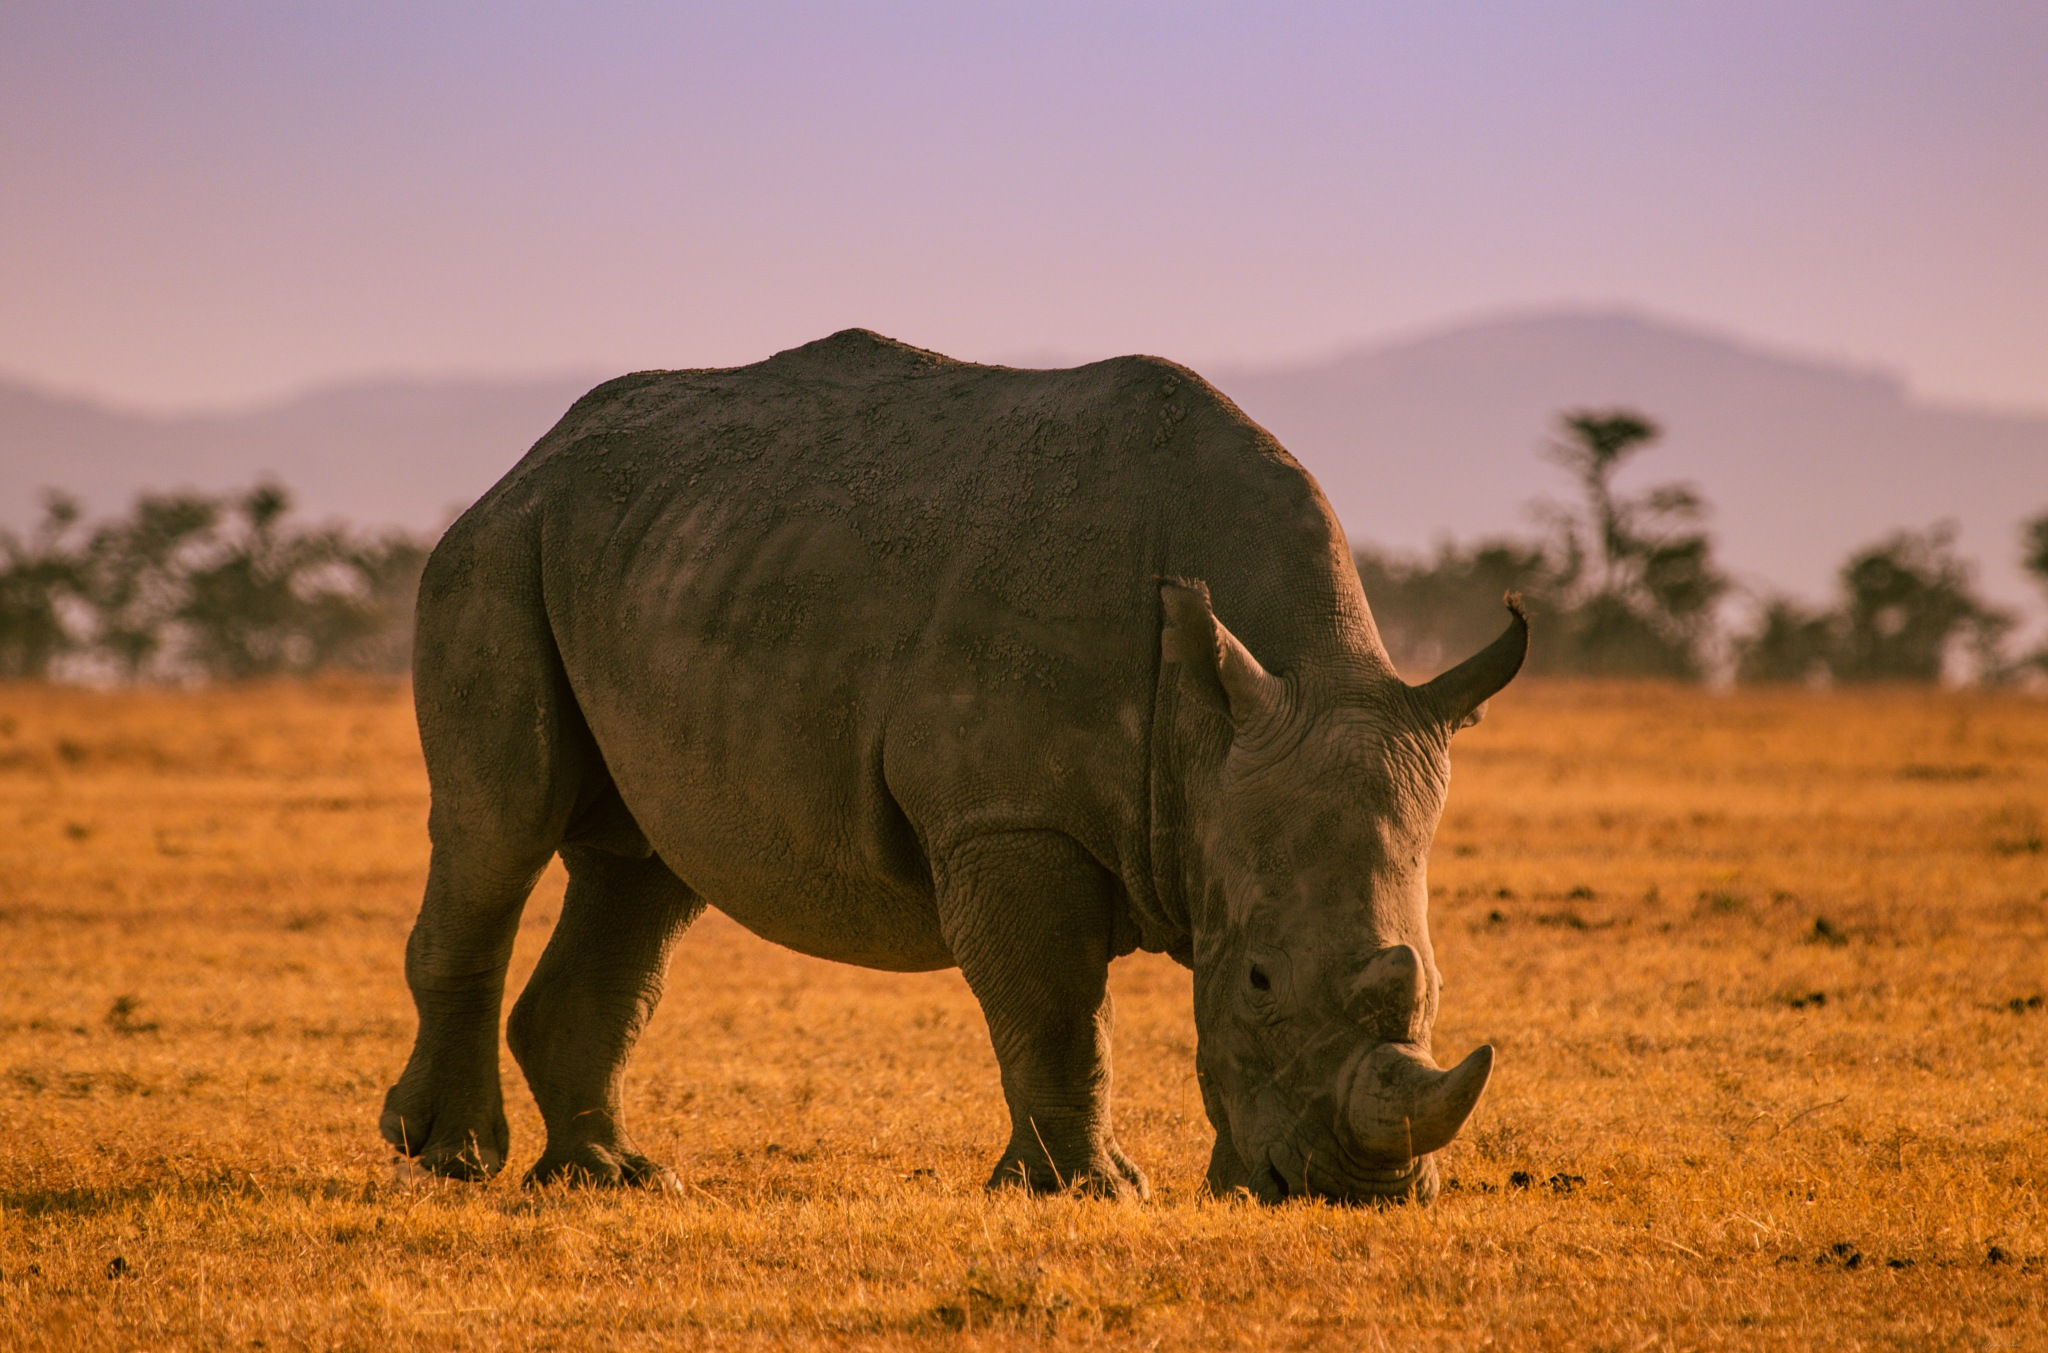 A rhino in the morning sun. by Yegor & Tanya